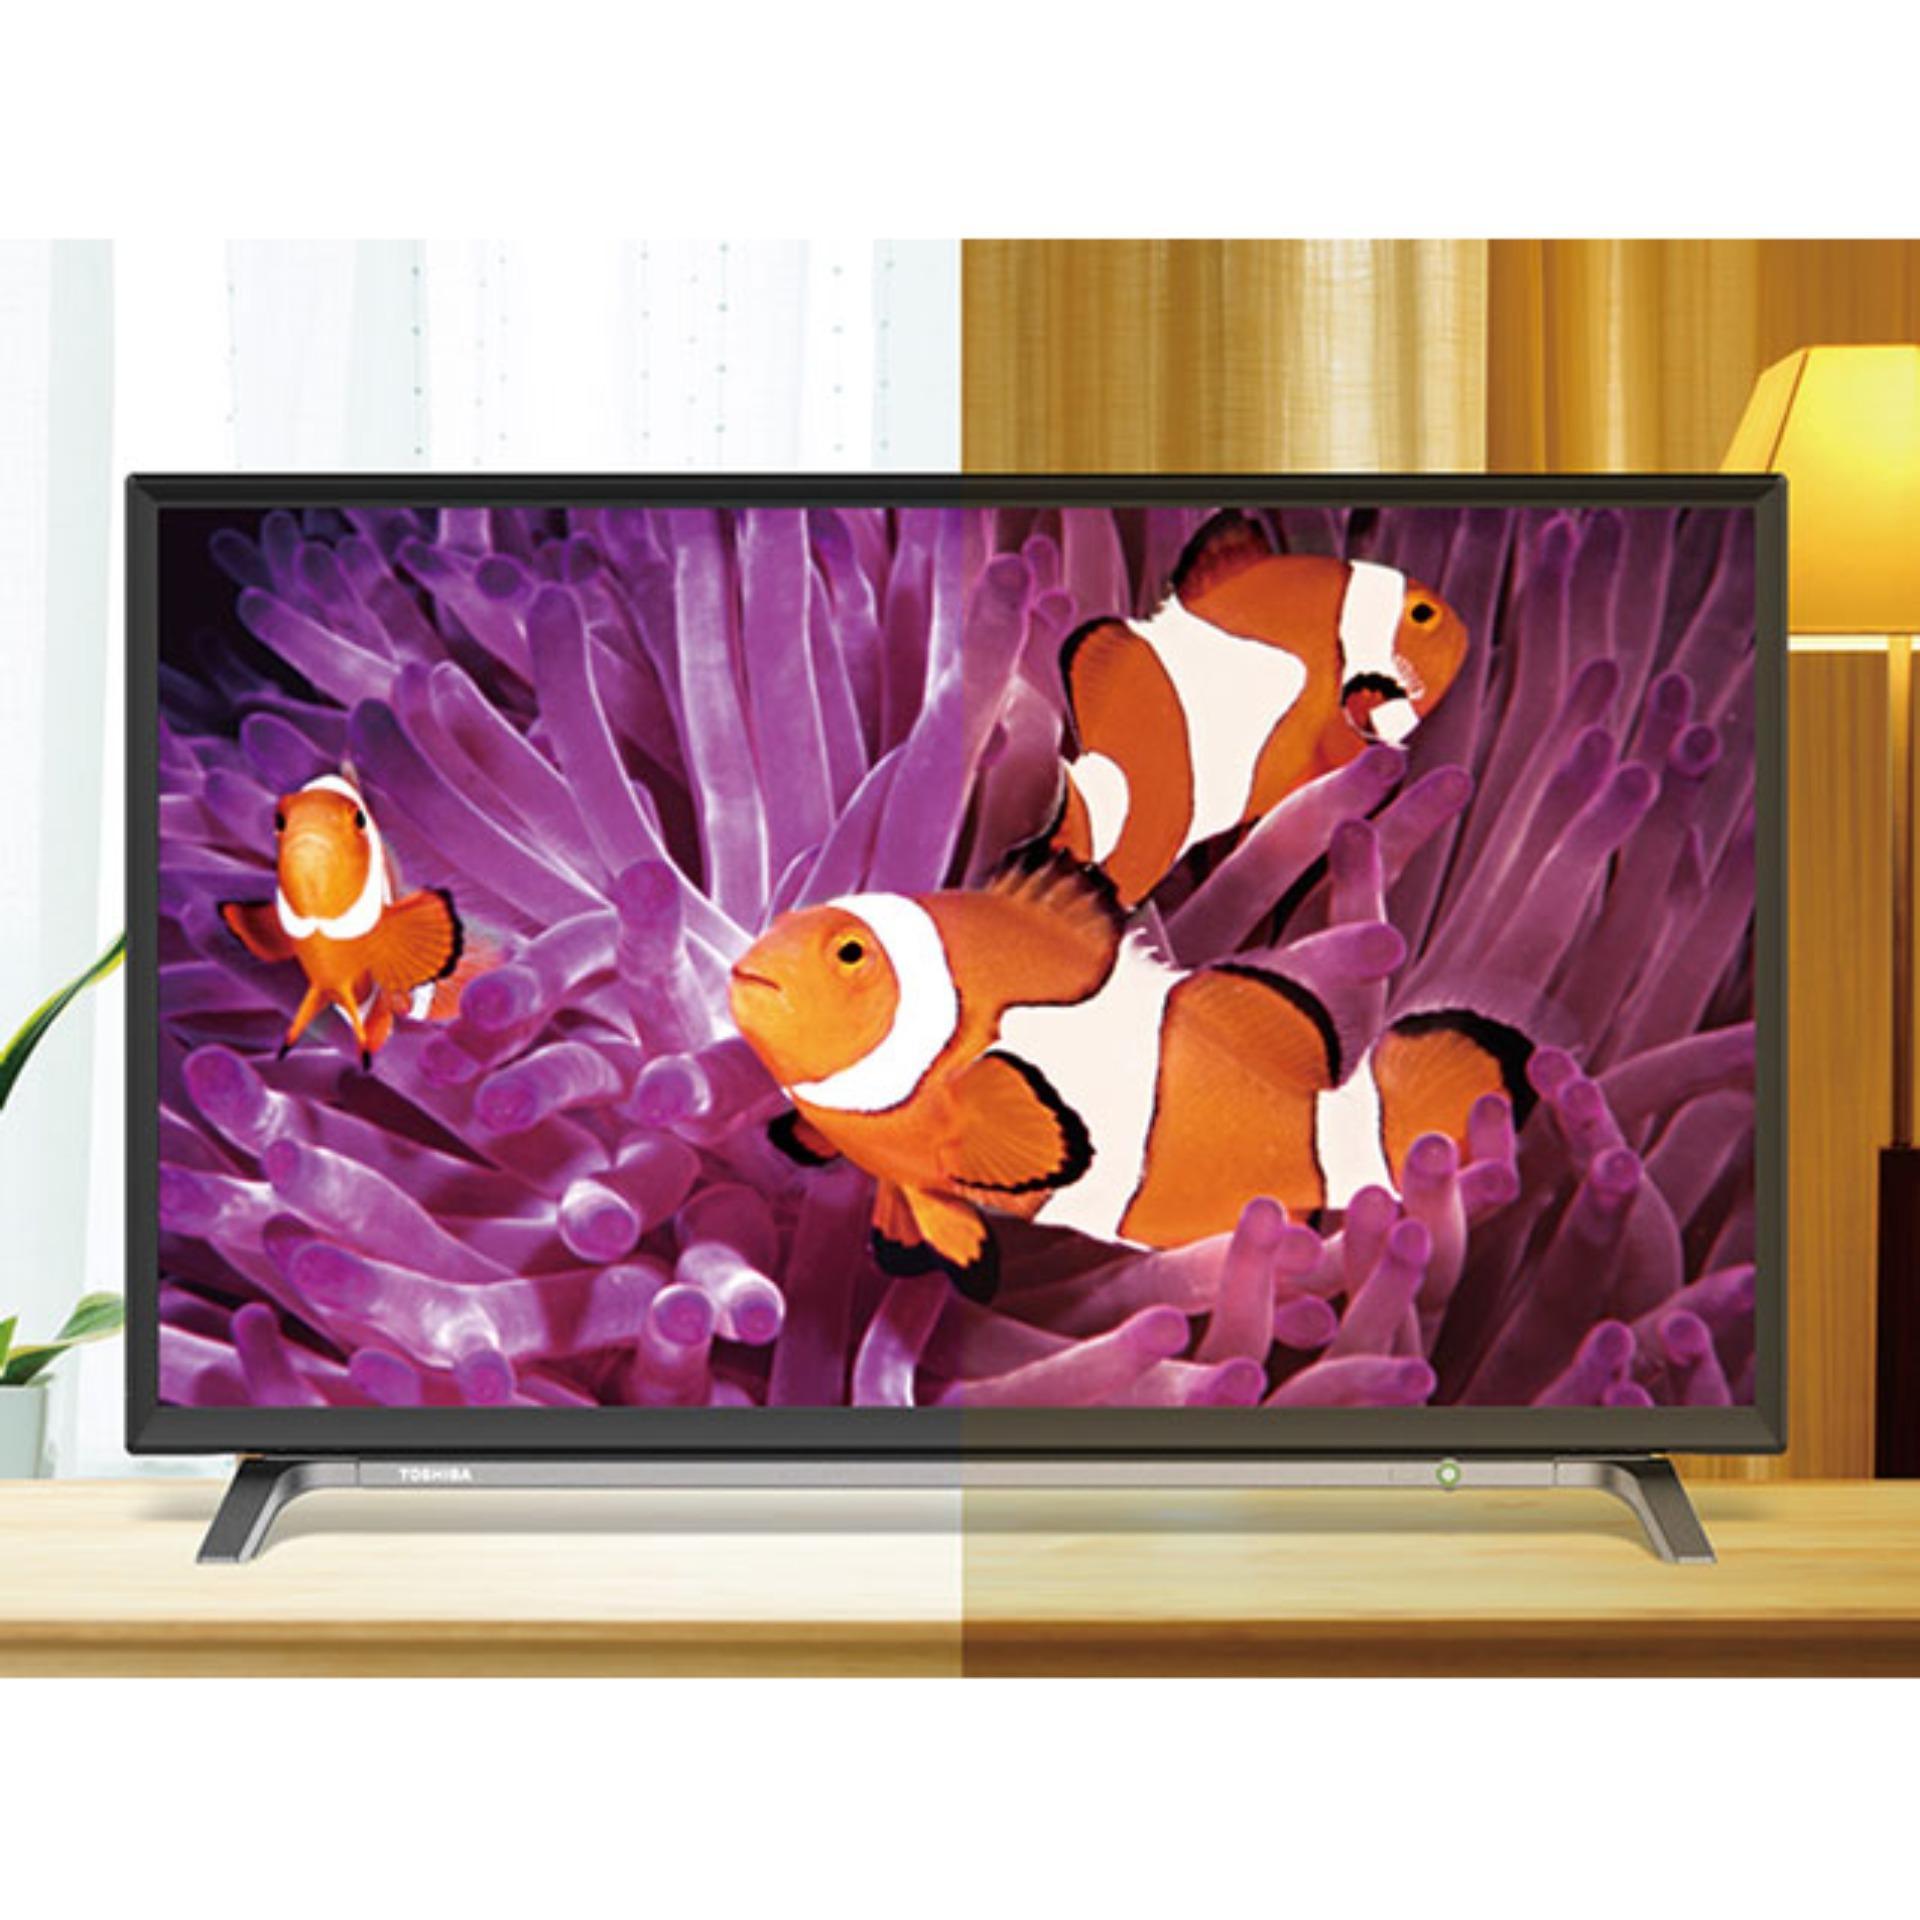 TOSHIBA - 43L5650VJ SMART TV FREE ONGKIR SURABAYA